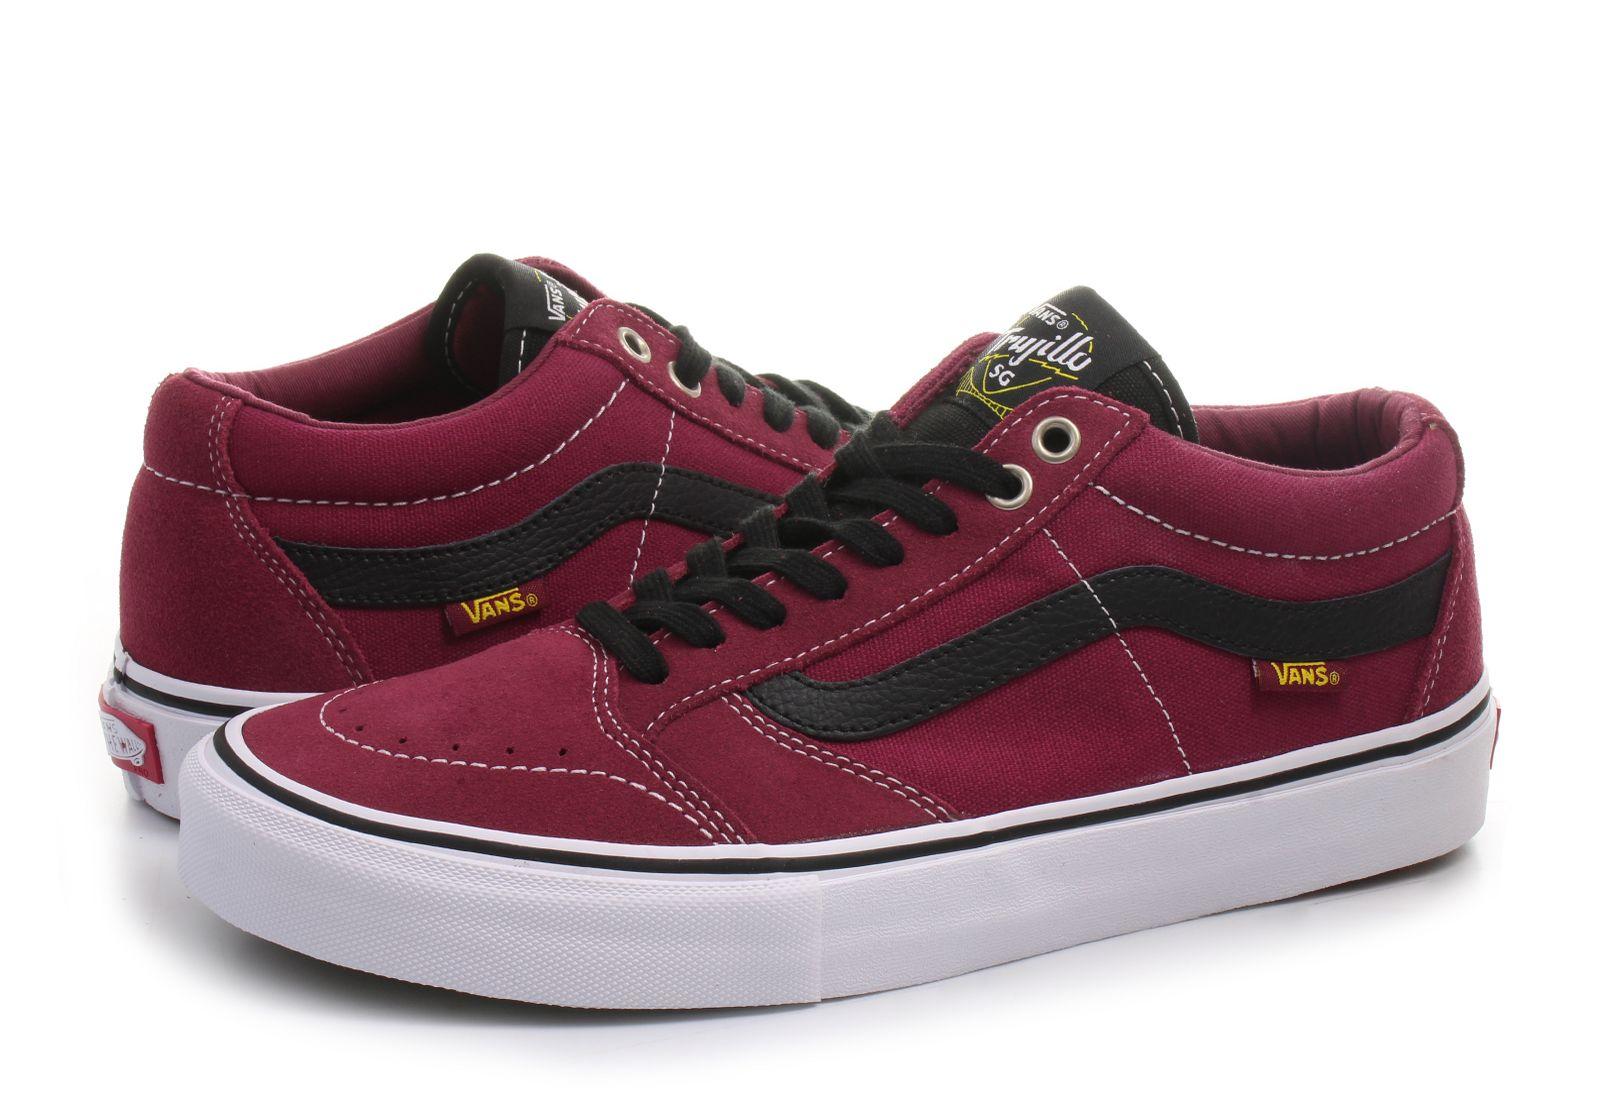 0d69985c810e Vans Sneakers - Tnt Sg - V00ZSNO3V - Online shop for sneakers ...